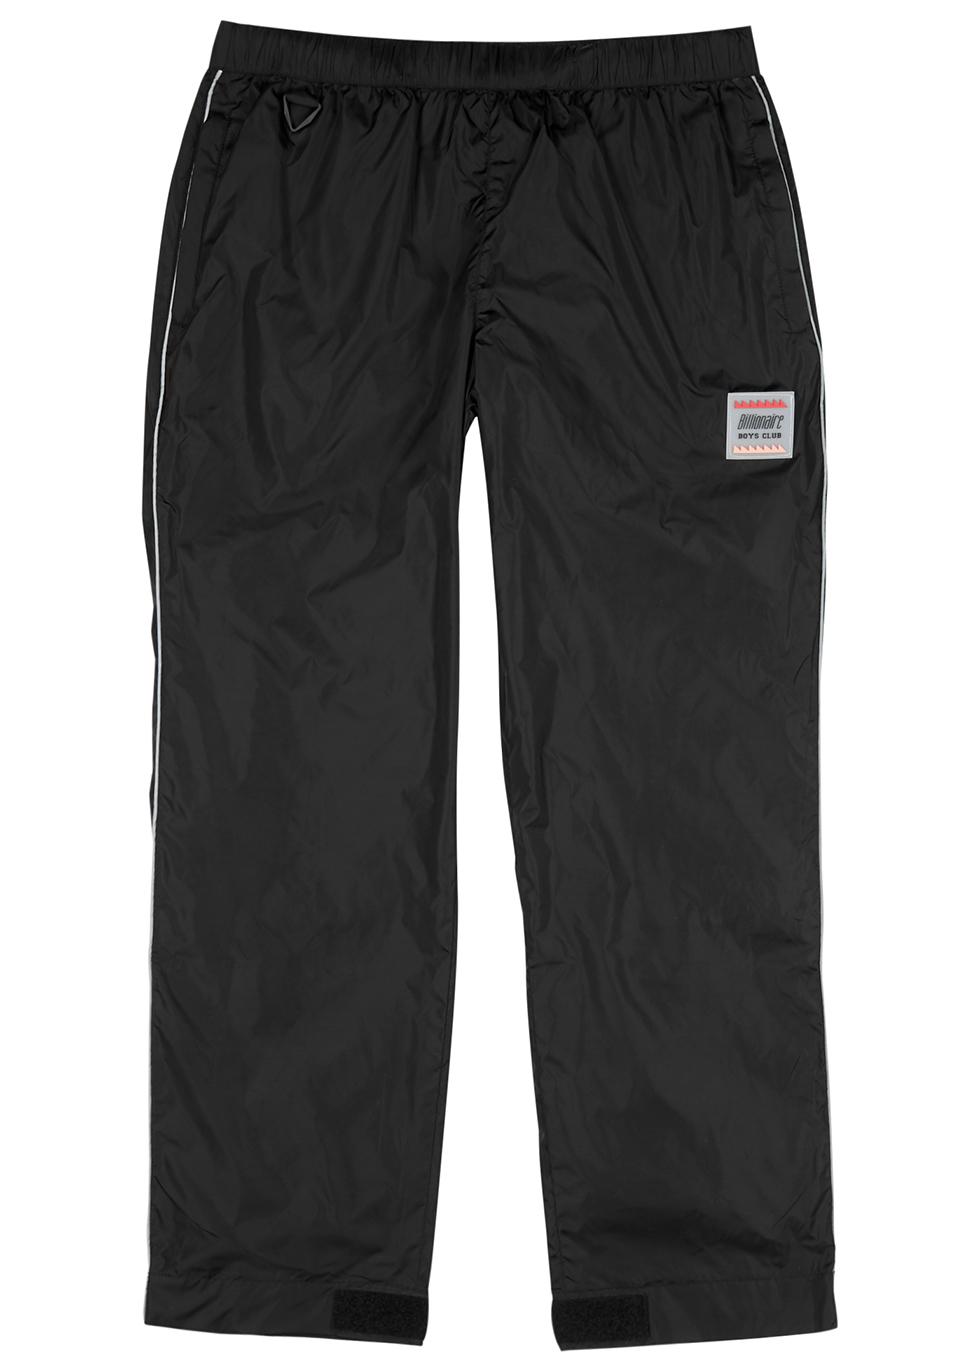 Black shell track pants - Billionaire Boys Club